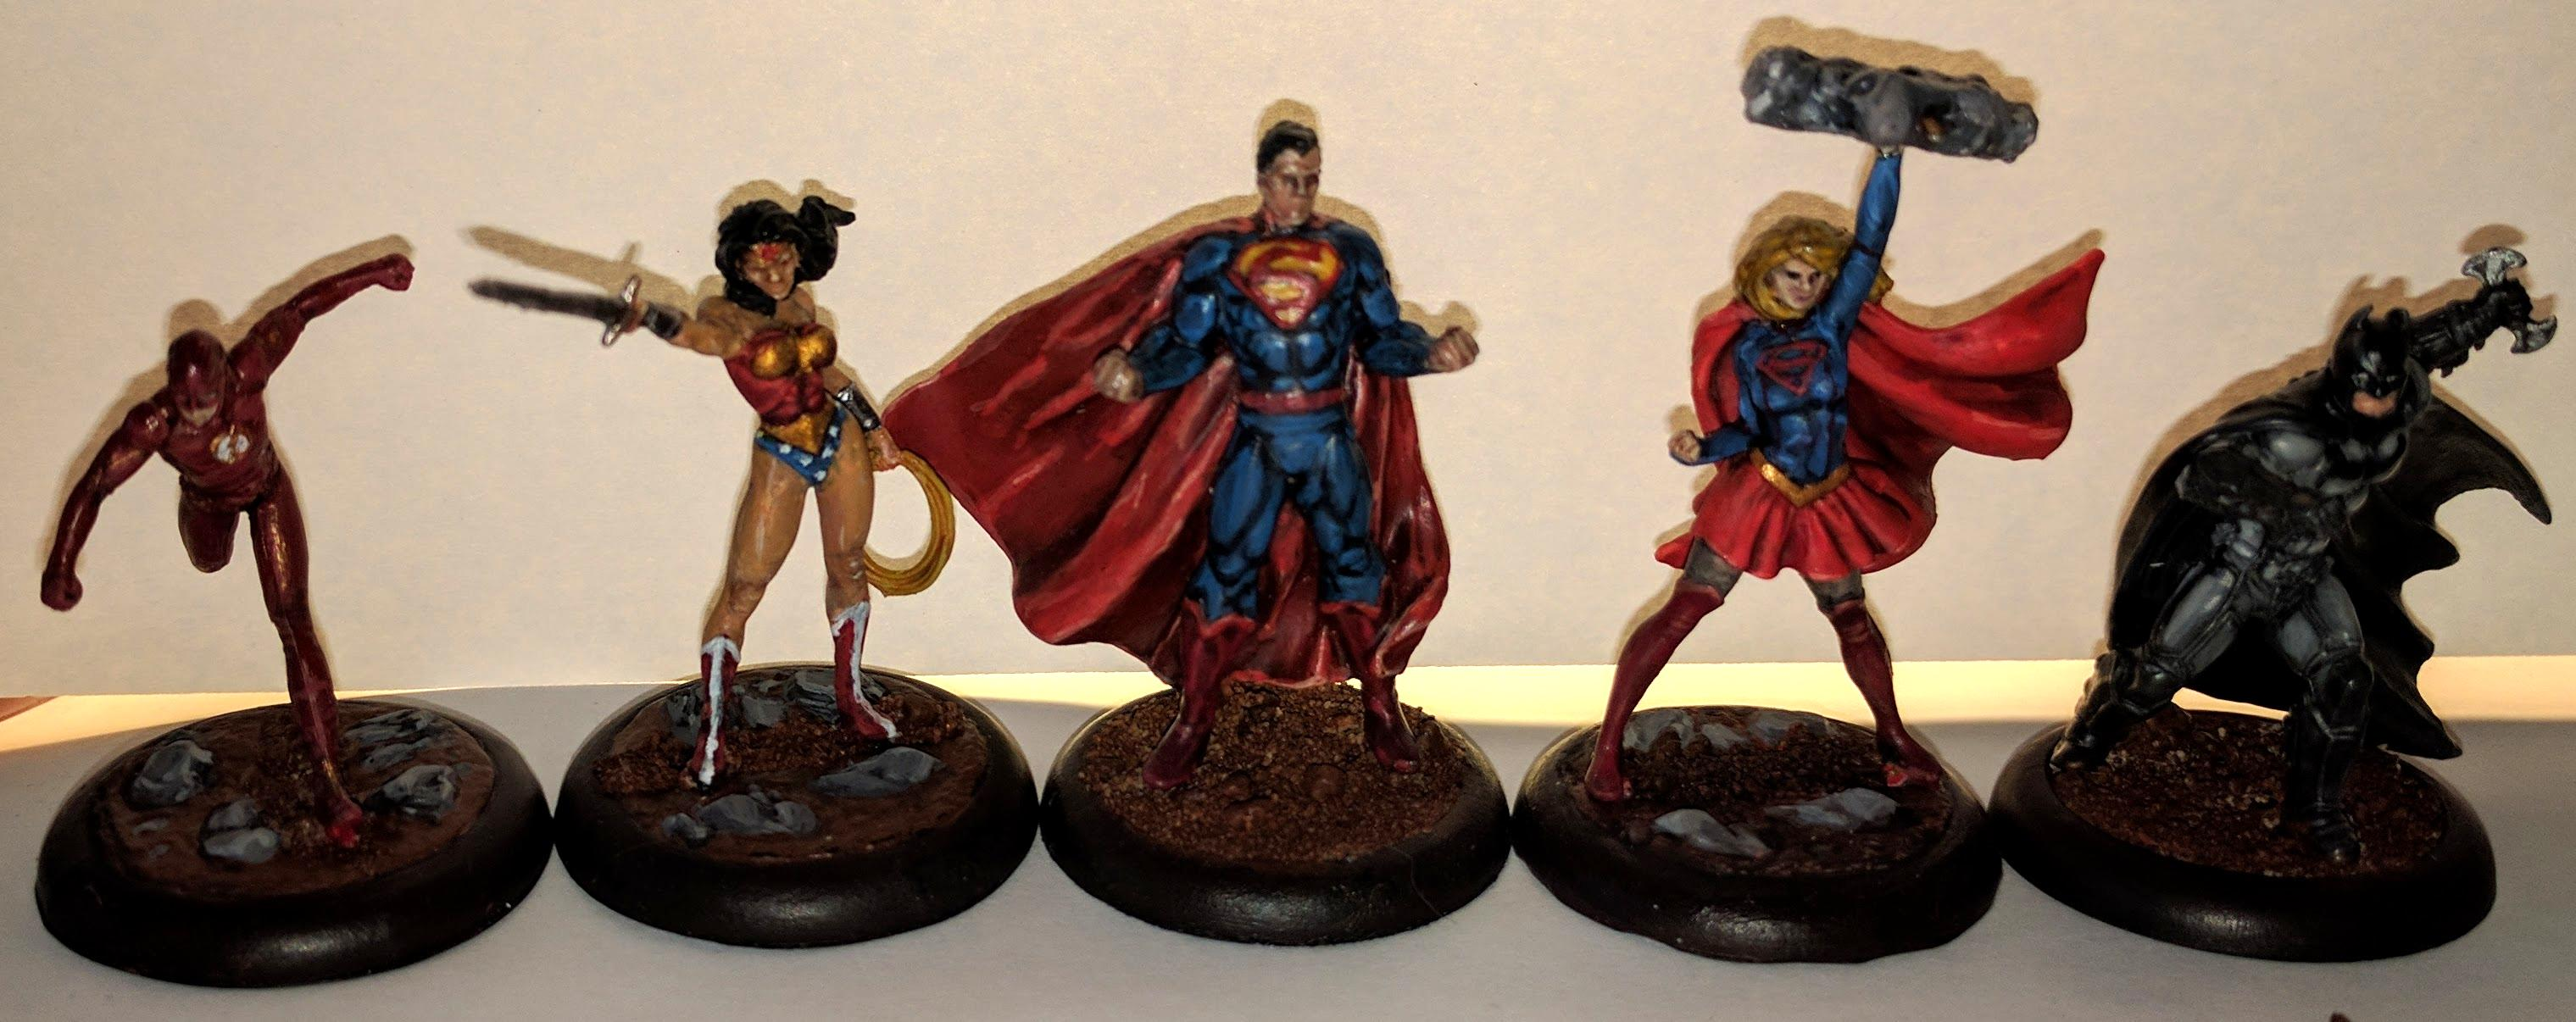 Batman, Dc Universe, Dcu, Flarrow, Jla, Jlu, Justice League, Supergirl, Superhero, Superman, Wonder Woman